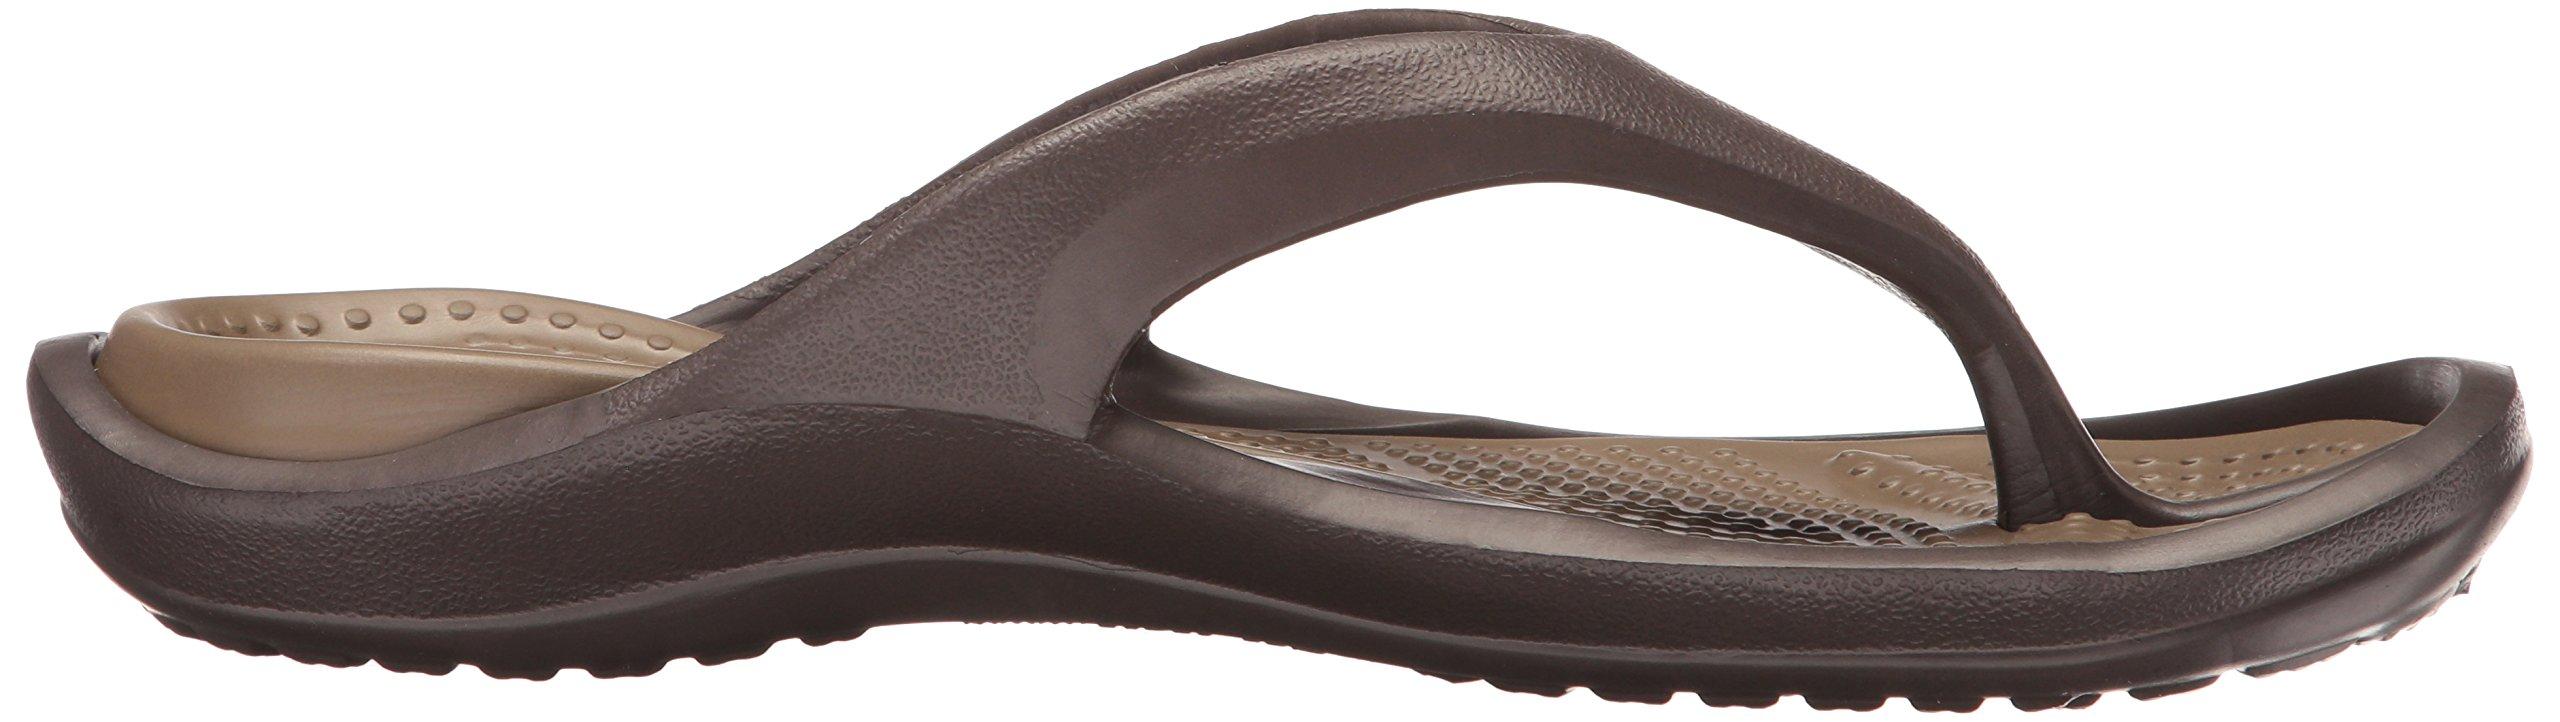 Crocs Athens Flip Flop, Espresso/Walnut, 10 US Men / 12 US Women by Crocs (Image #7)